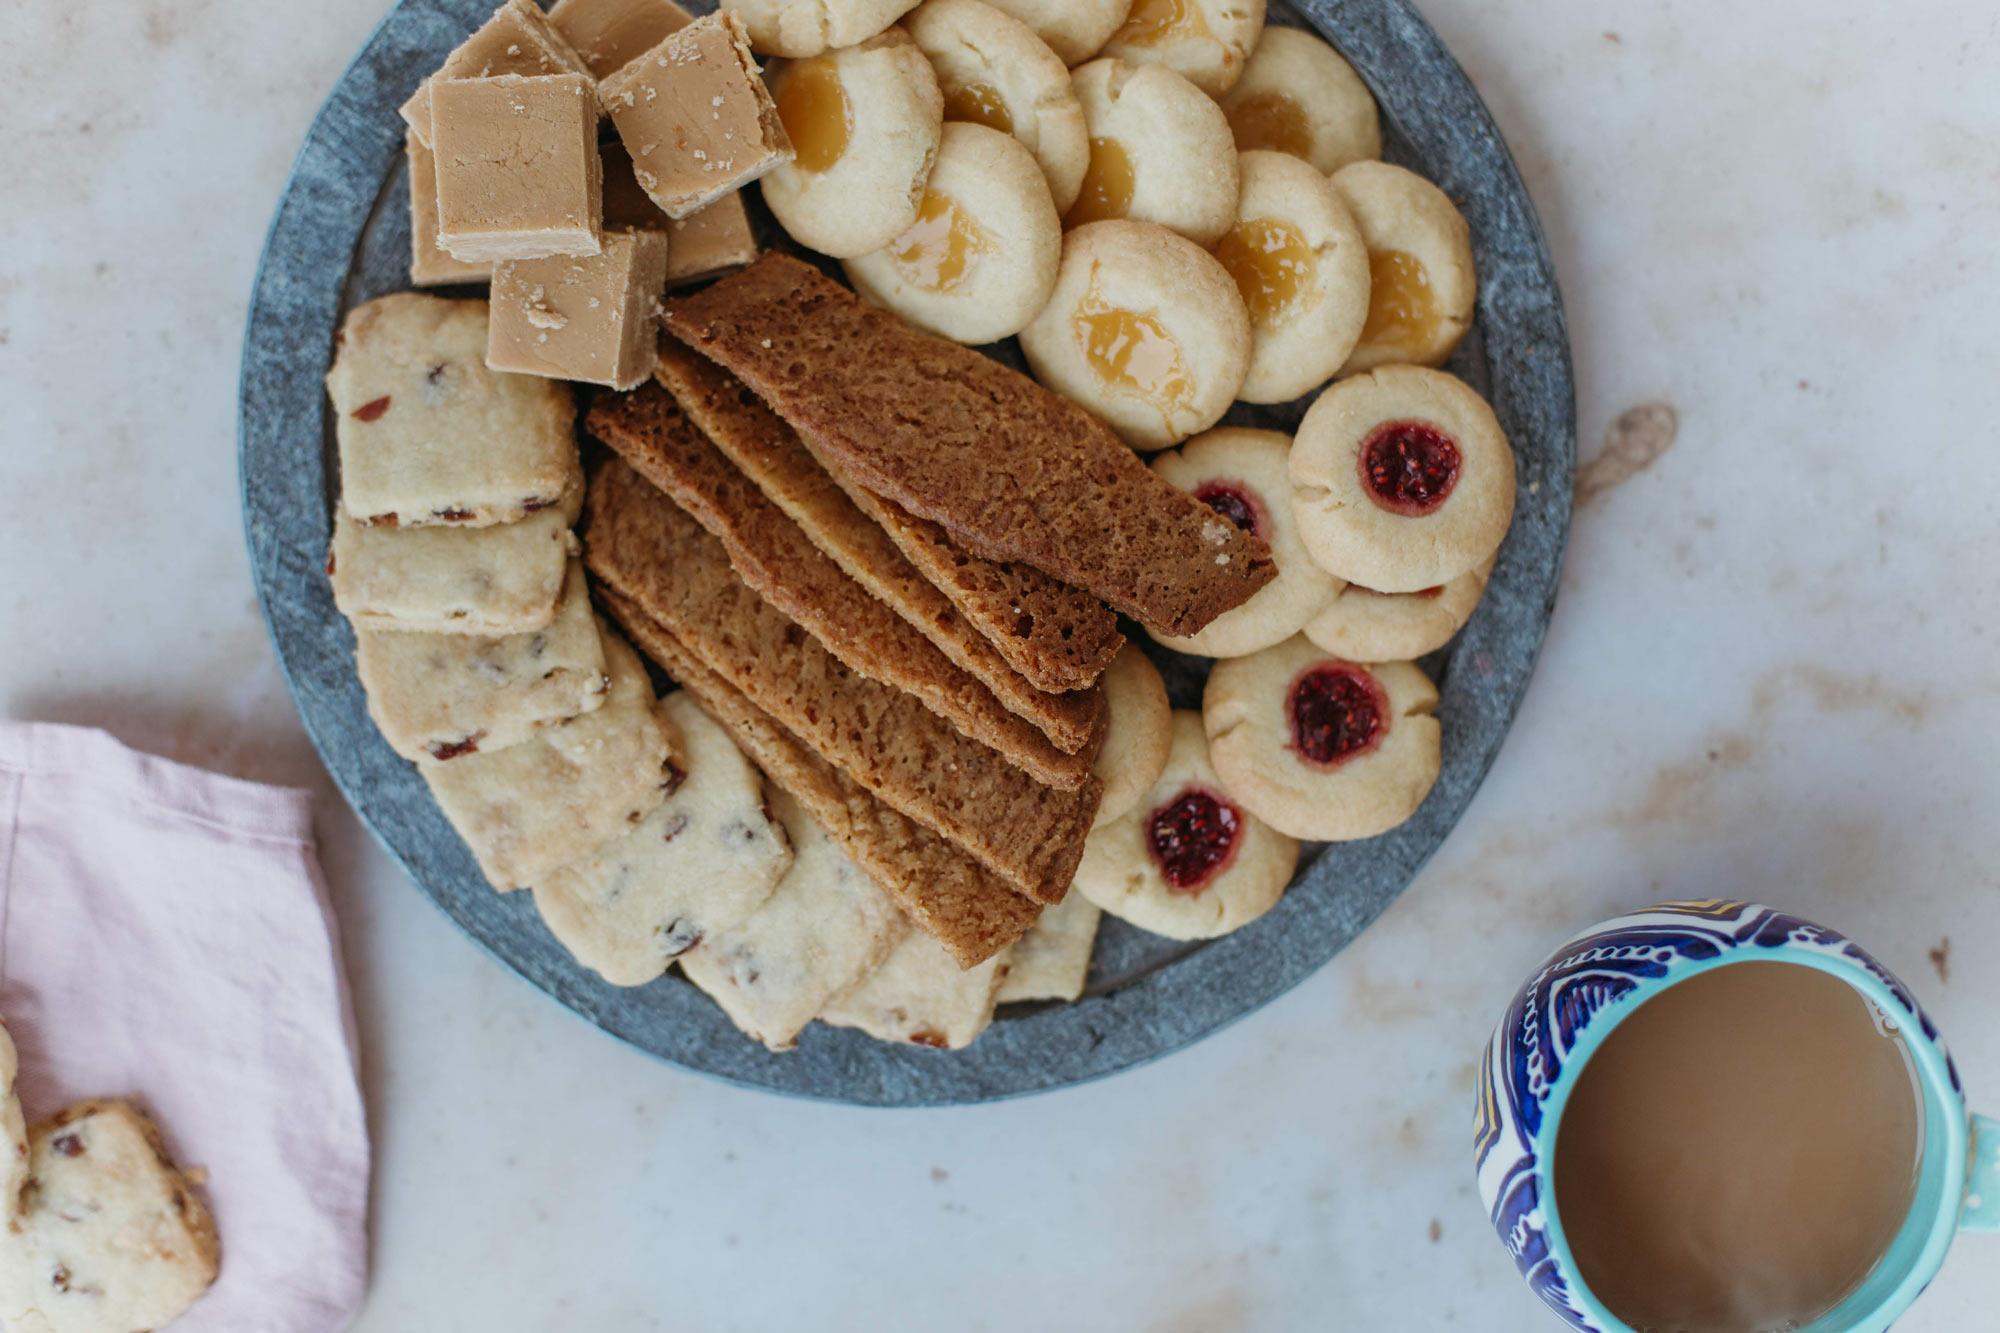 H&R-biscuit-platter-3.jpg